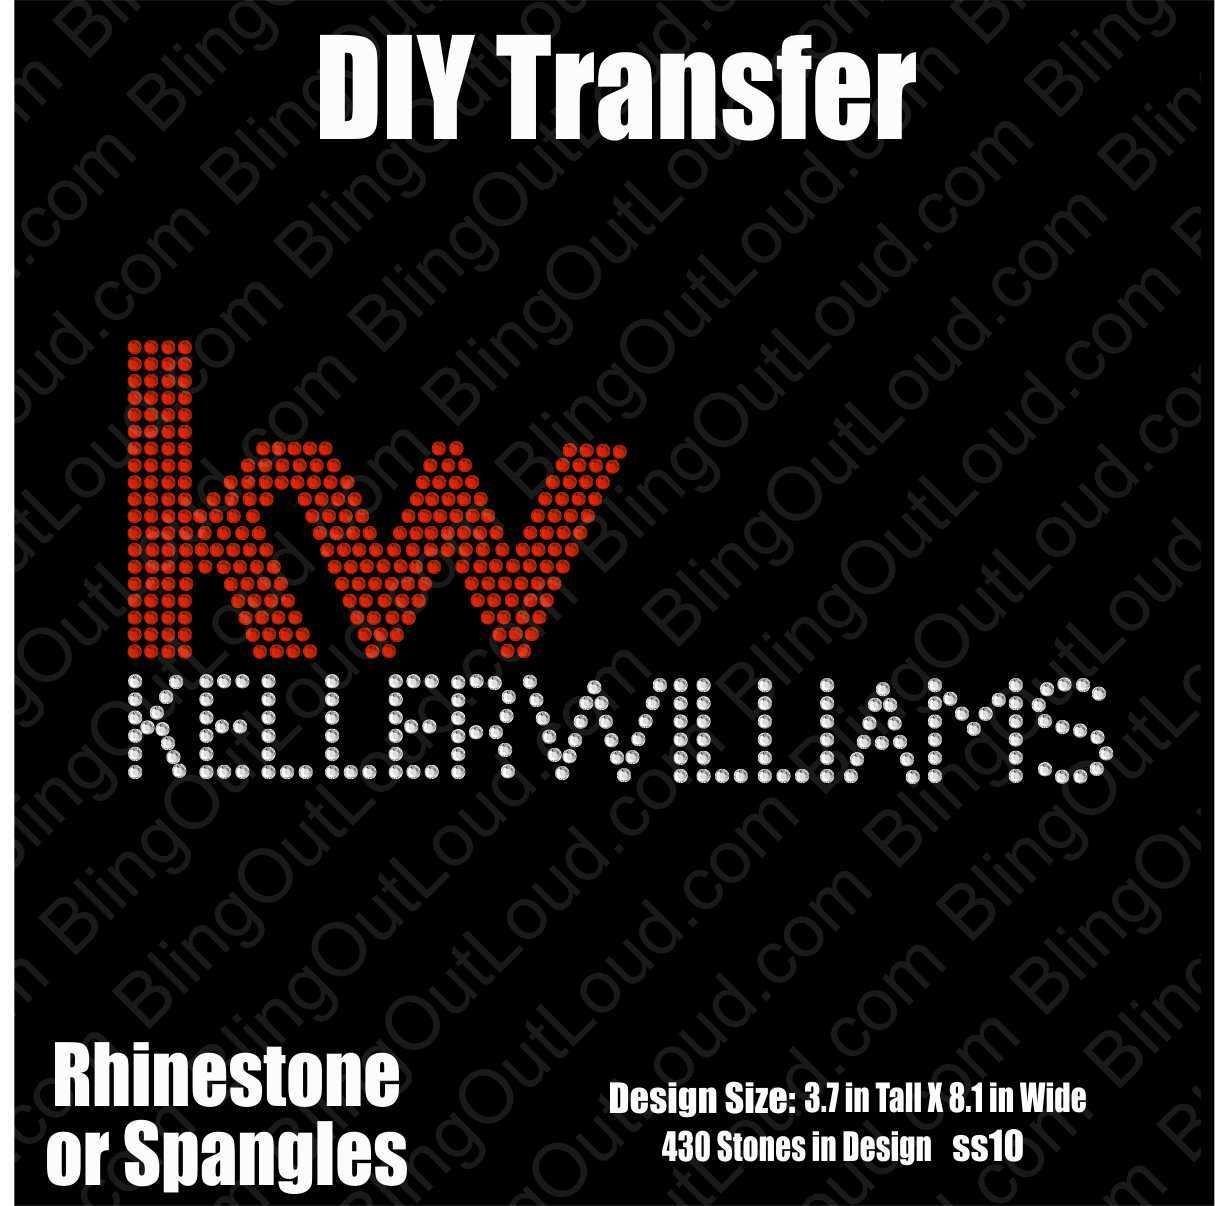 Keller Williams Realty DIY Rhinestone Transfer